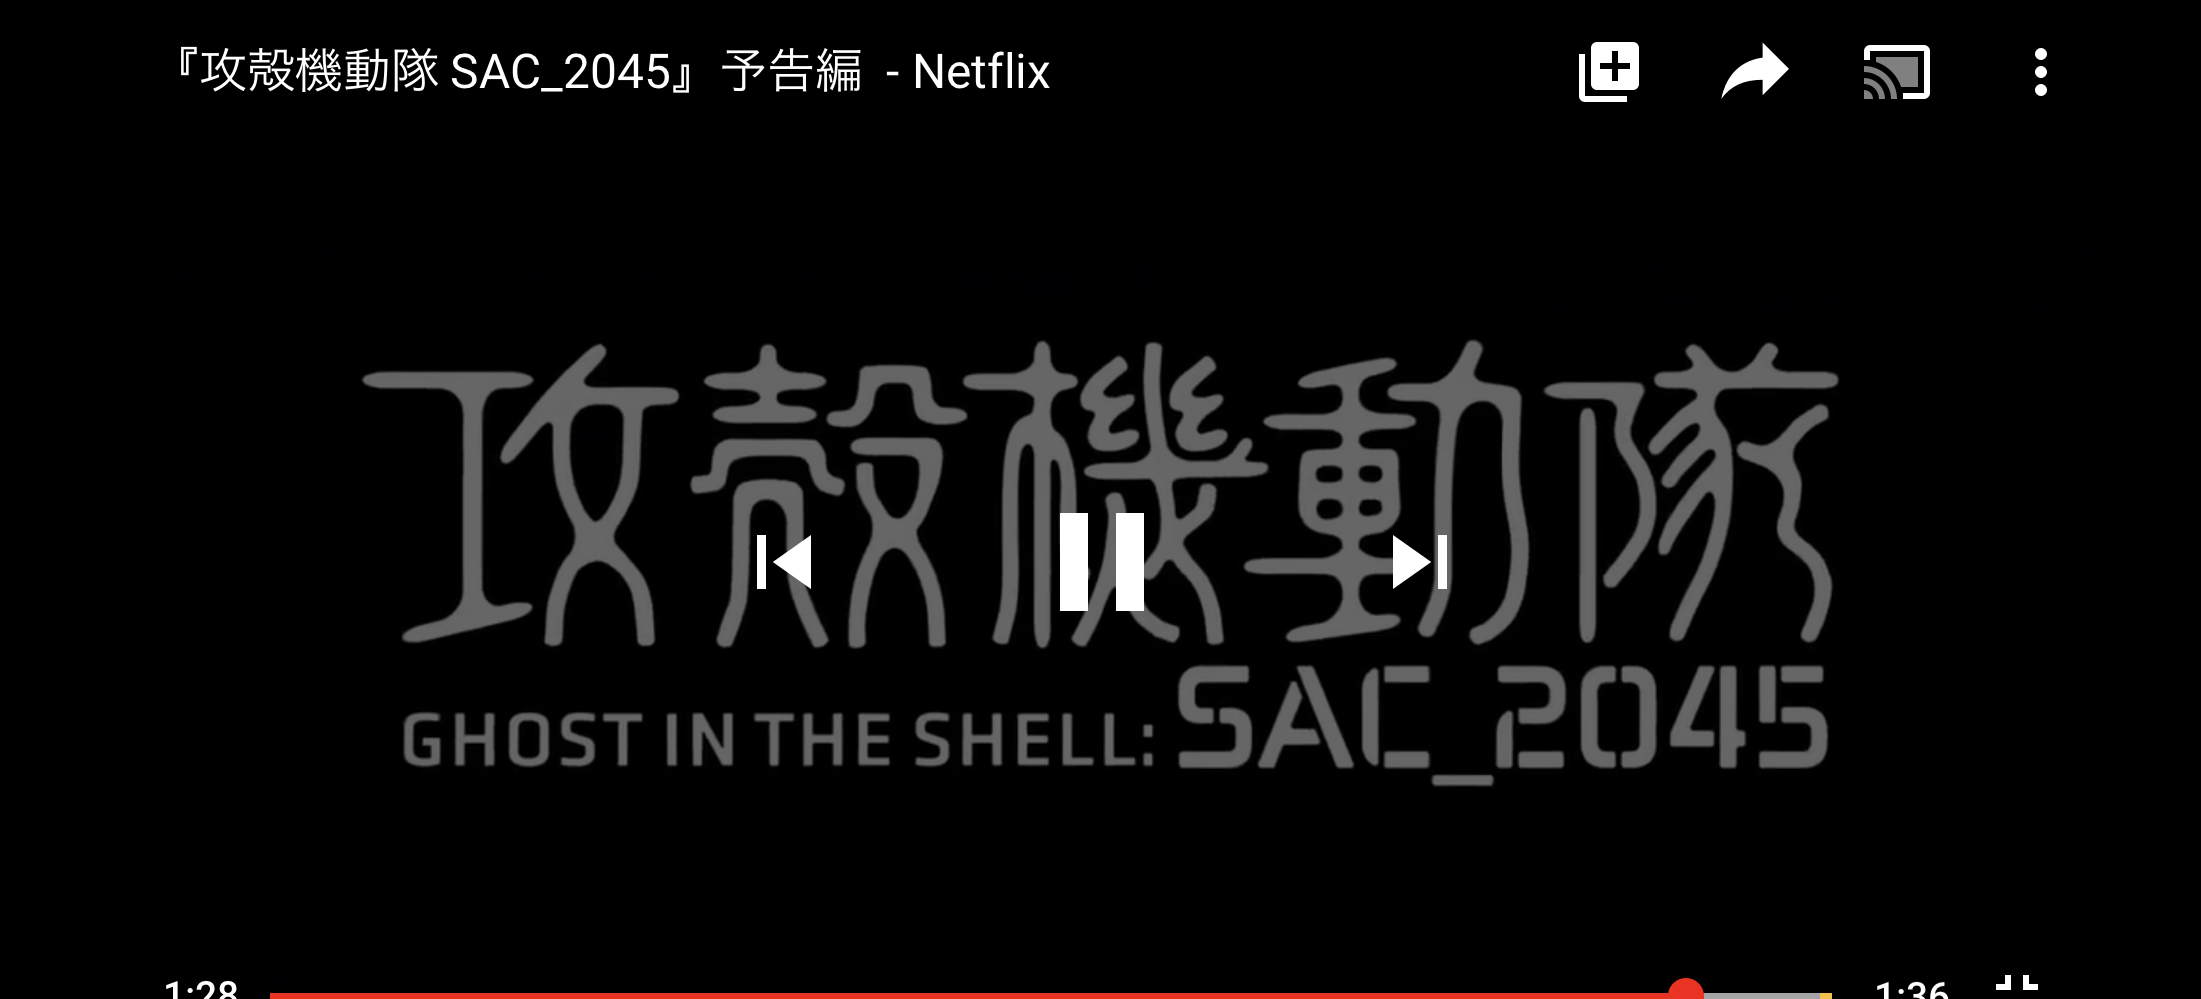 Koukakukidotai Ghost in the shell sac_2045 Netflix new series will start April 2020 globally